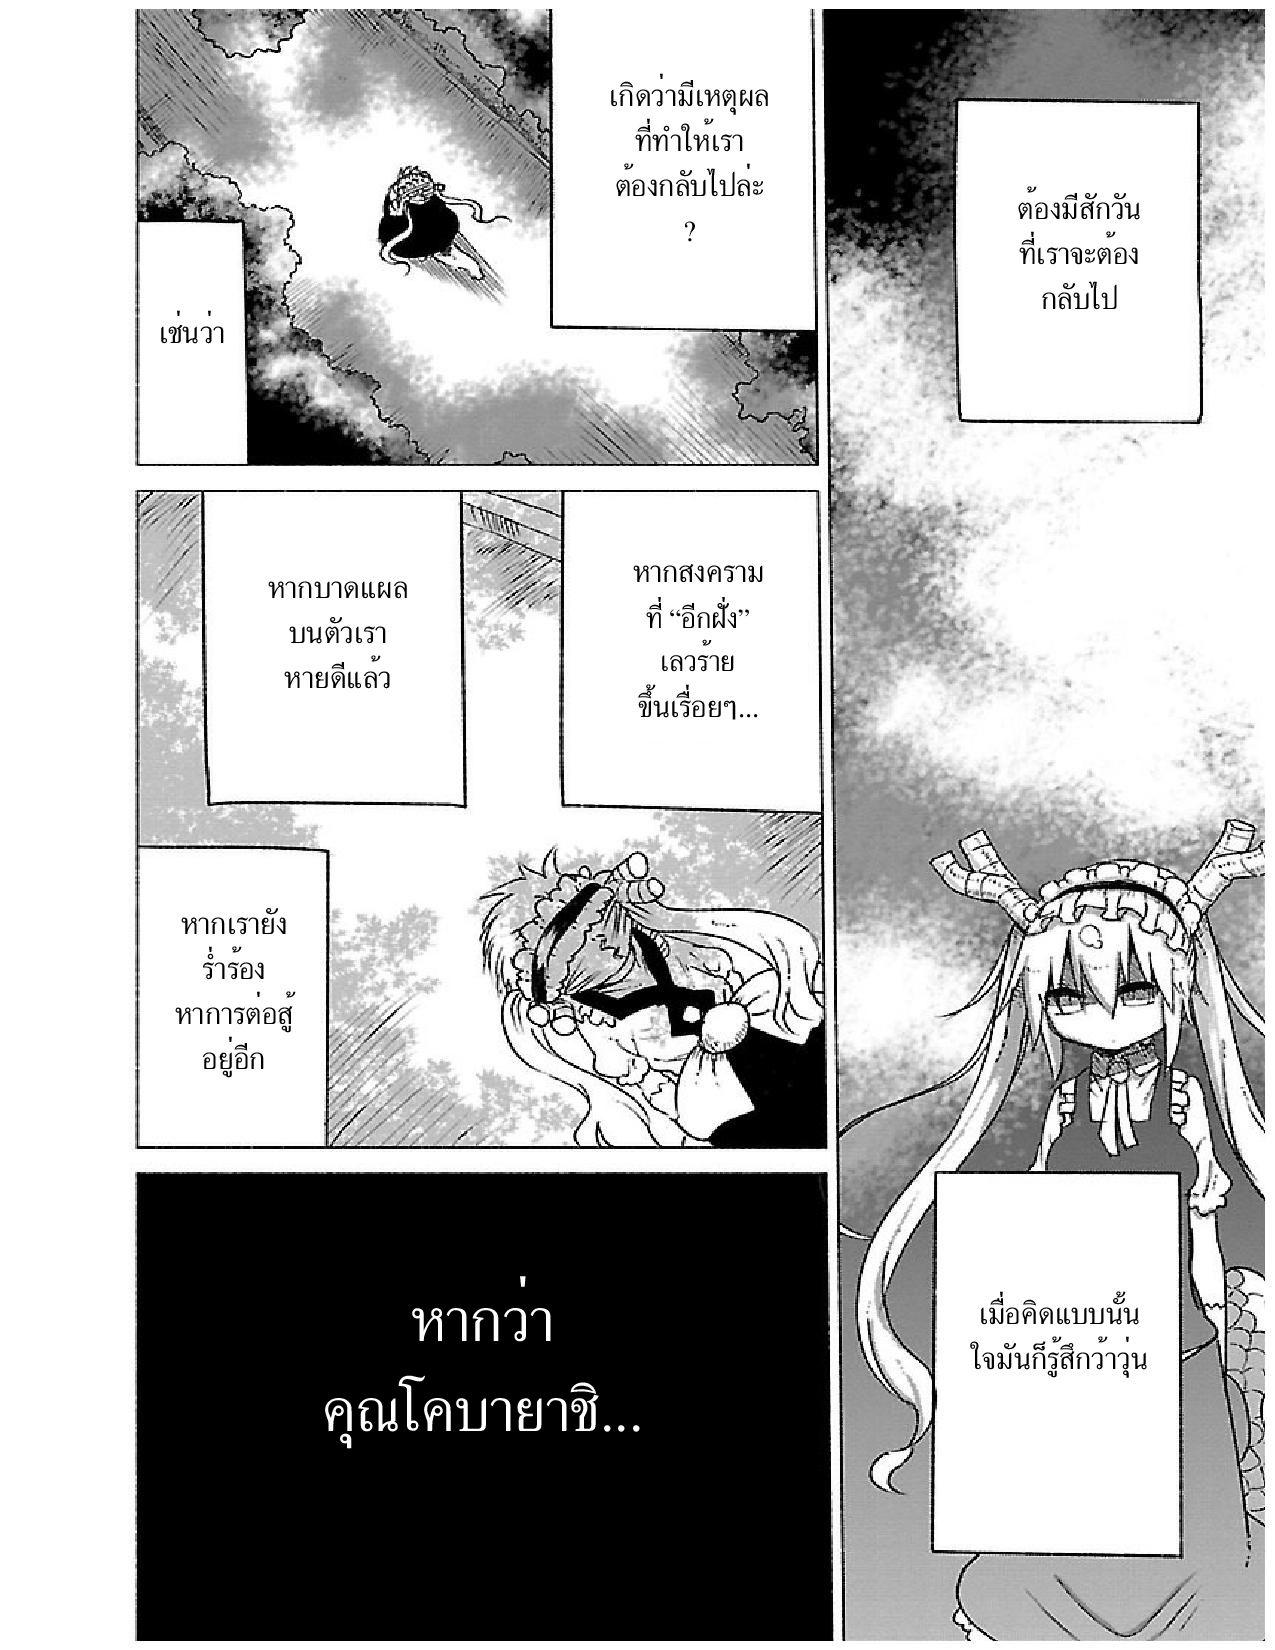 Kobayashi-san Chi no Maid Dragon ตอนที่ 19 TH แปลไทย